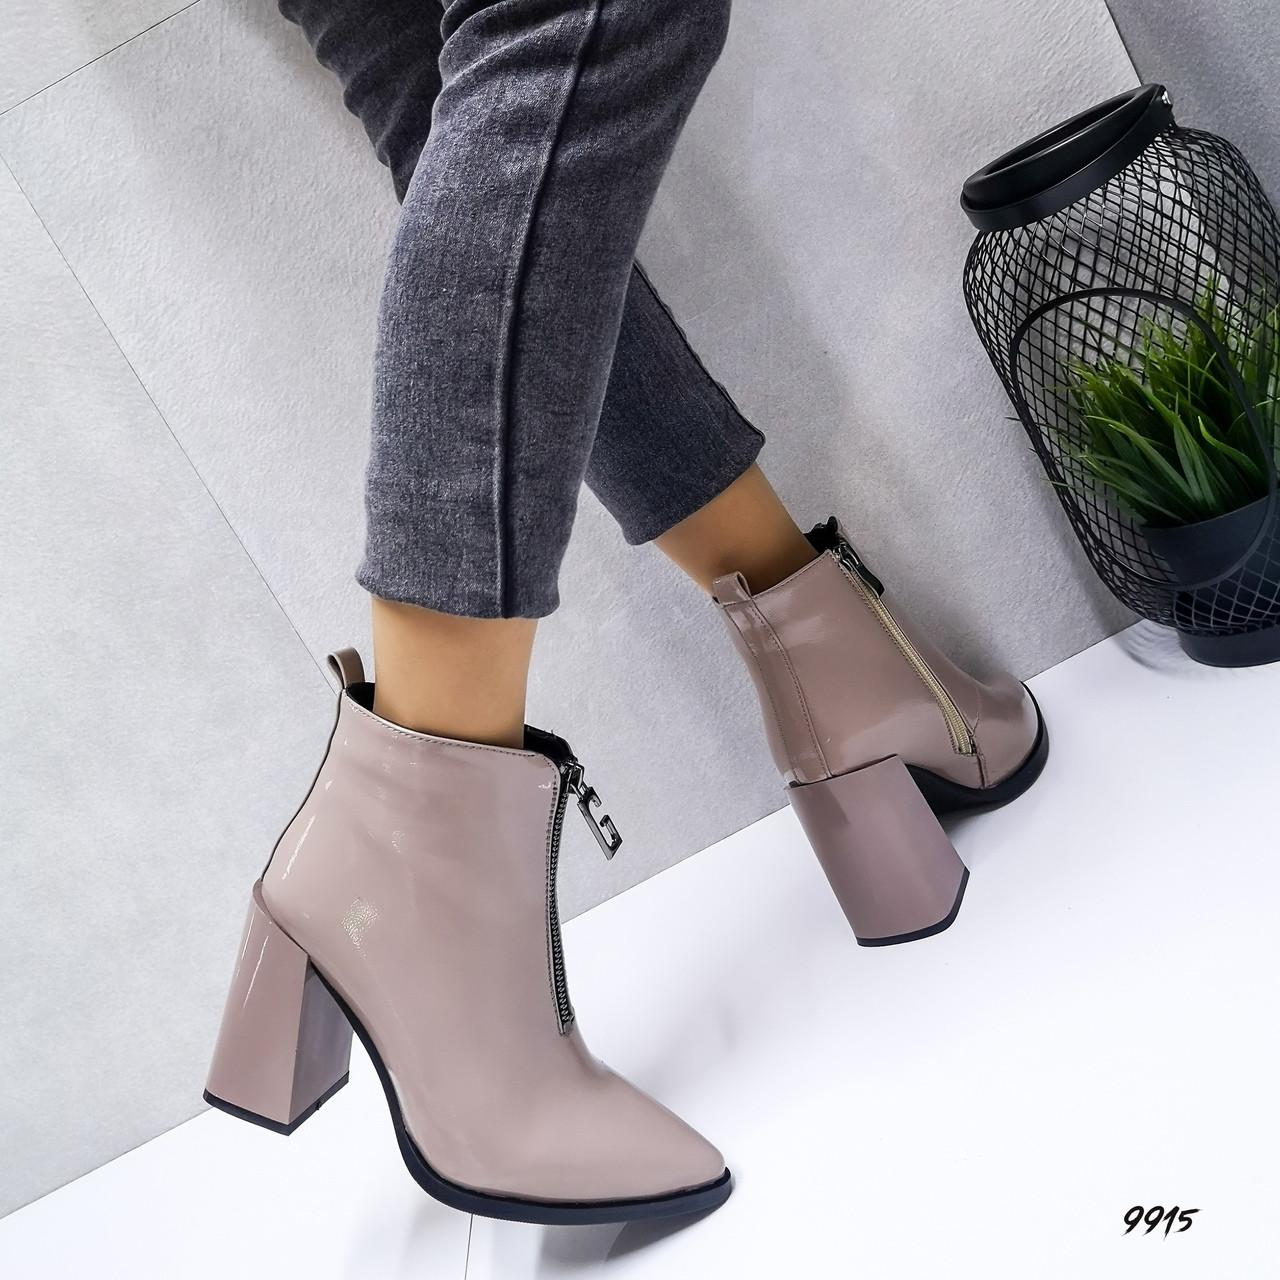 Женские ботинки Цвет - Бежевый